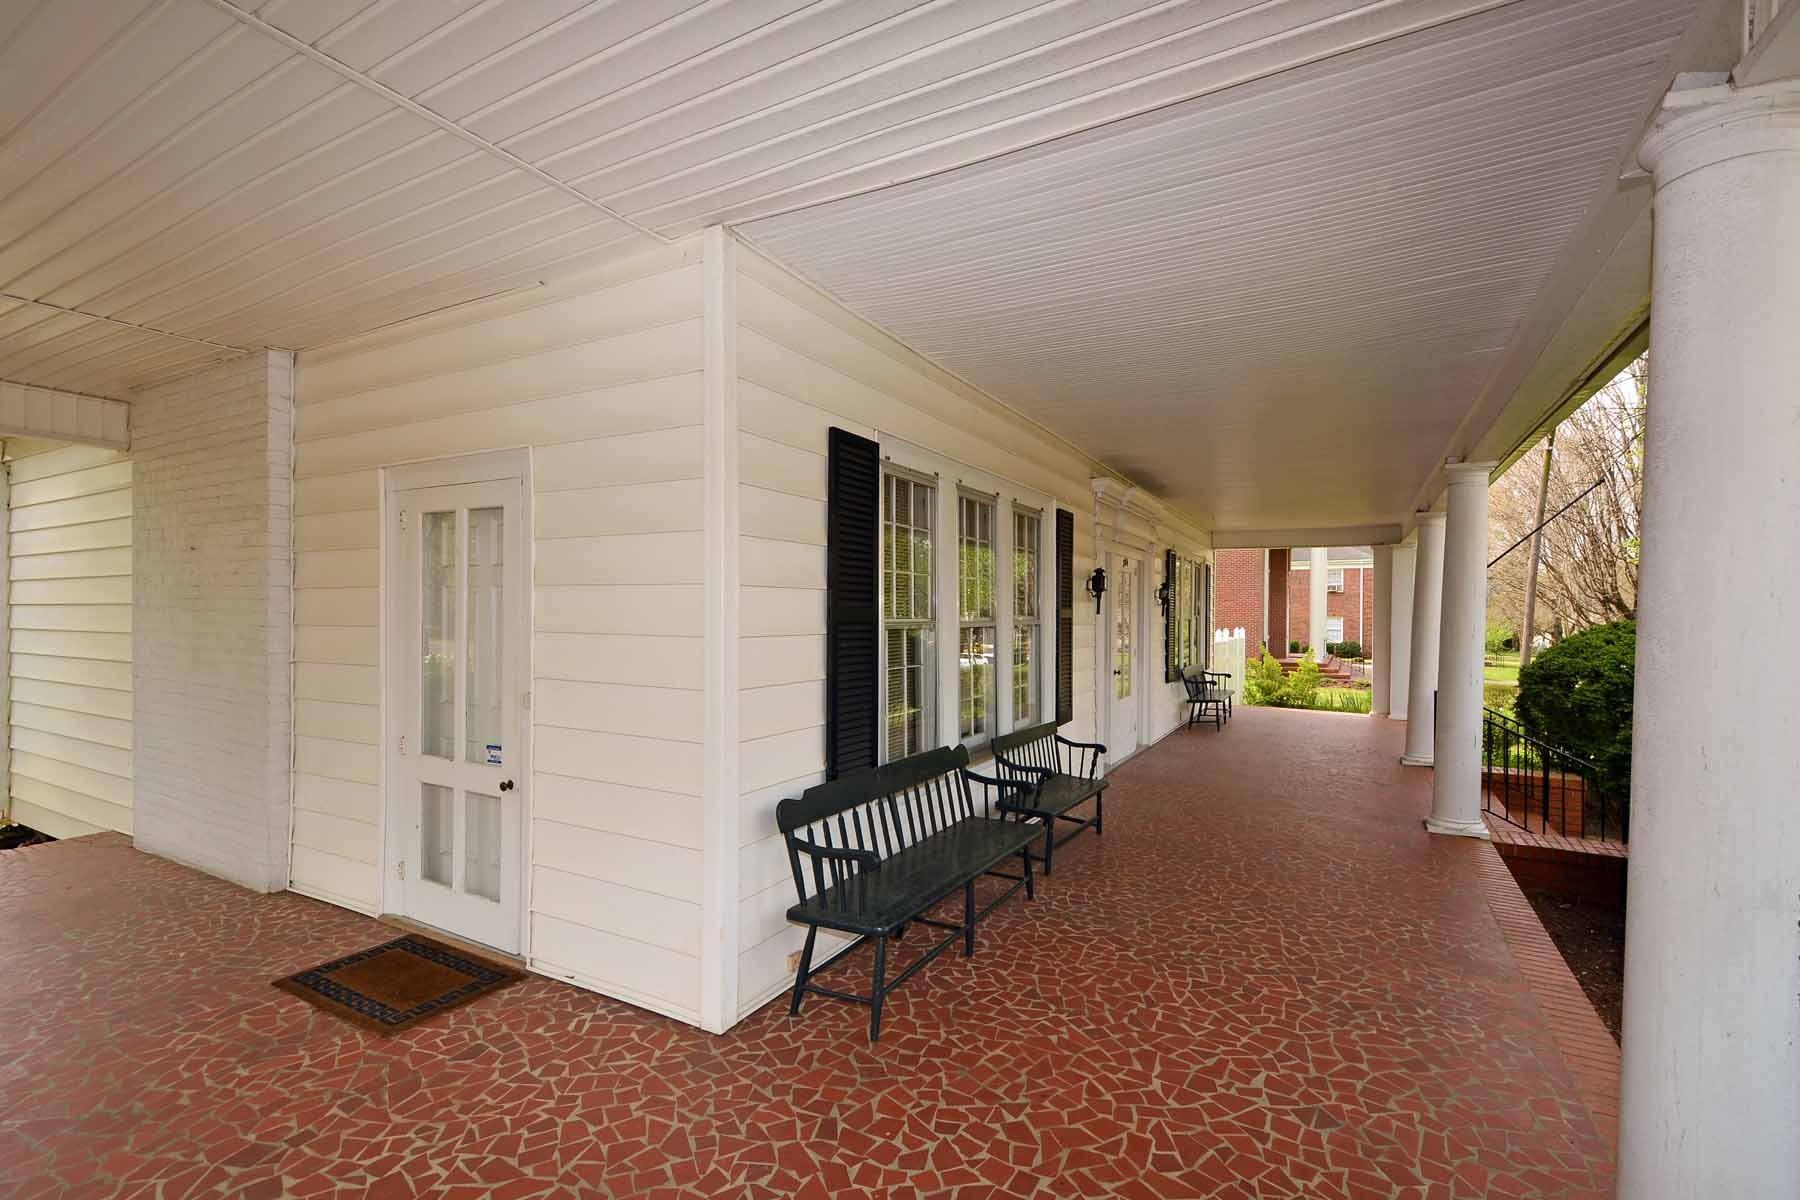 Additional photo for property listing at Bell House 304 N. Main St Warrenton, Carolina Del Norte 27589 Estados Unidos